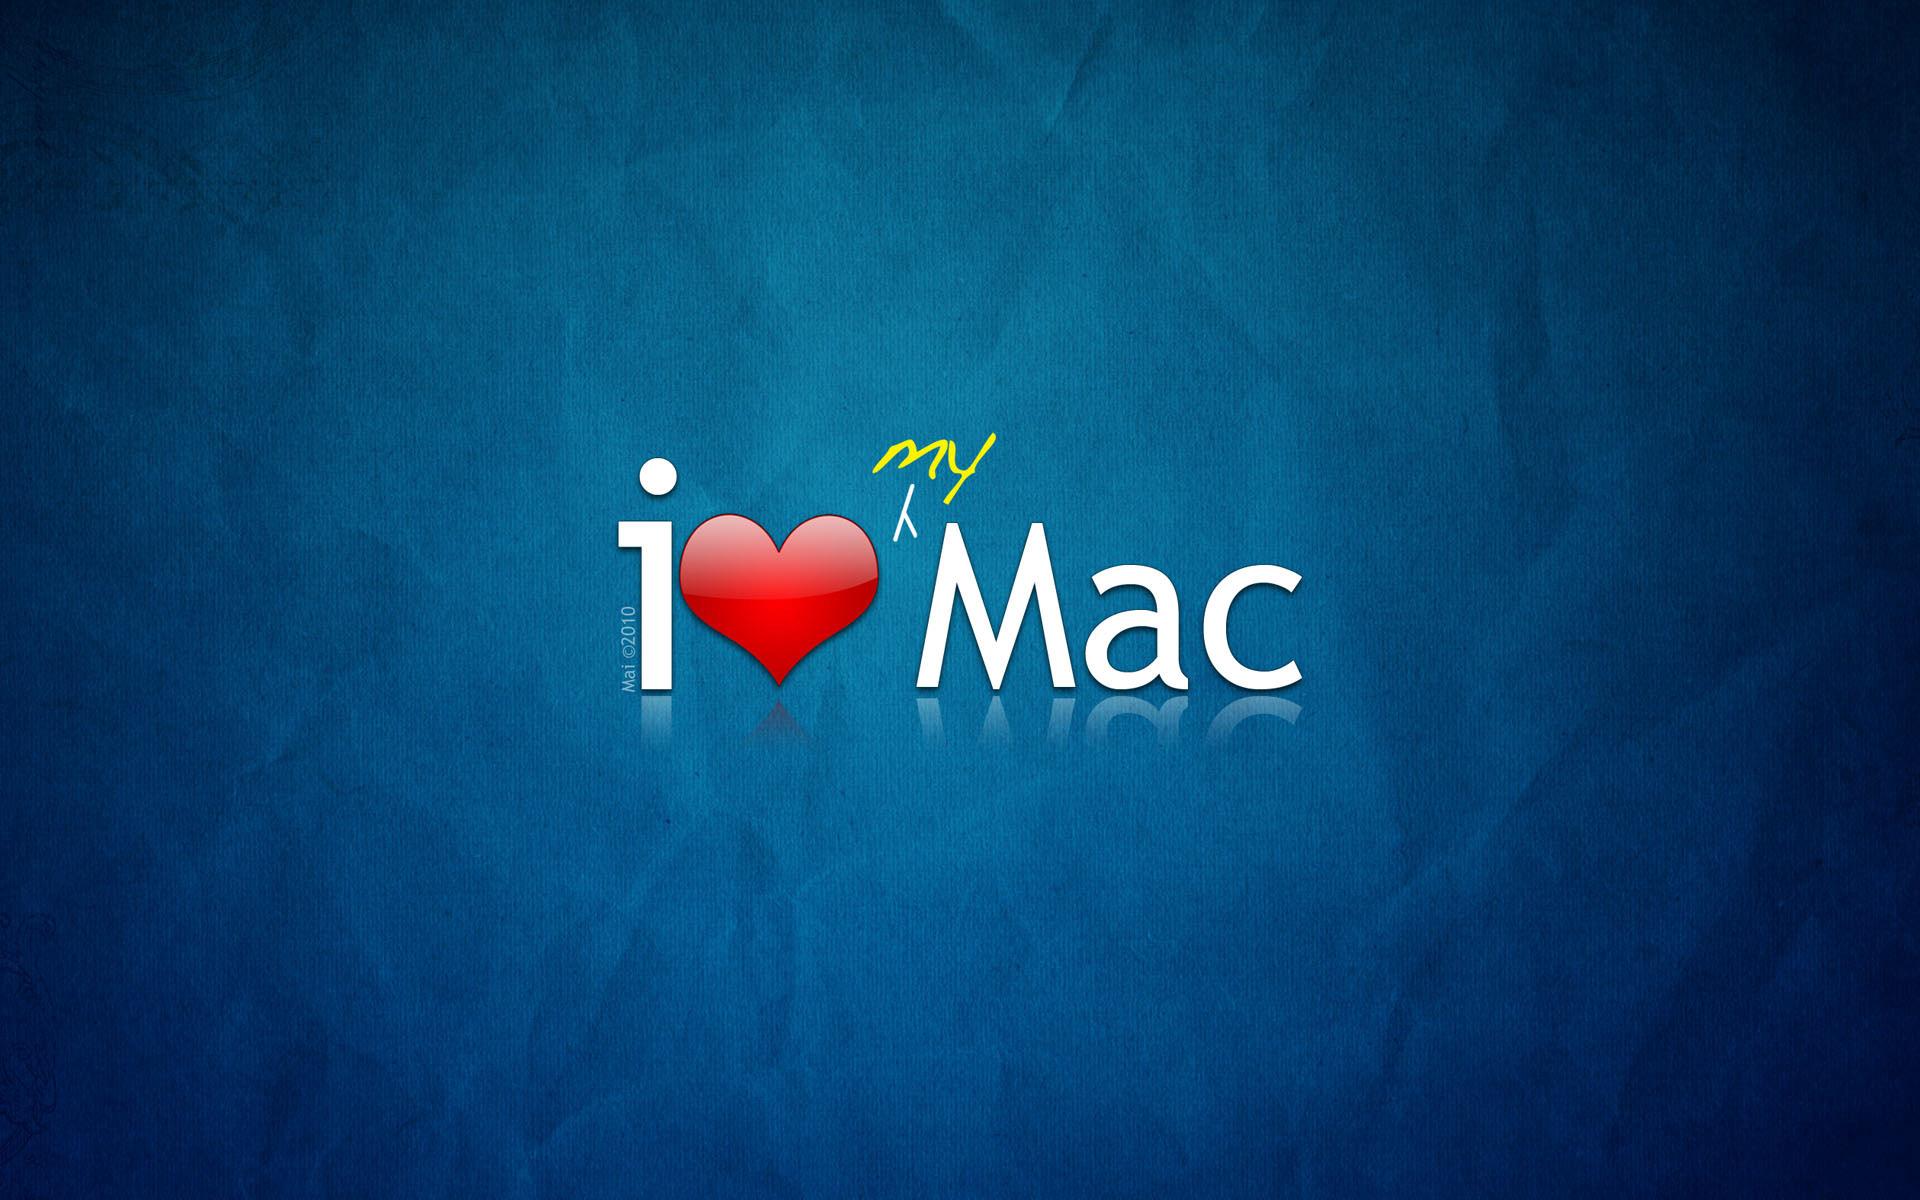 Apple Mac Wallpapers Pack 3 1920x1200